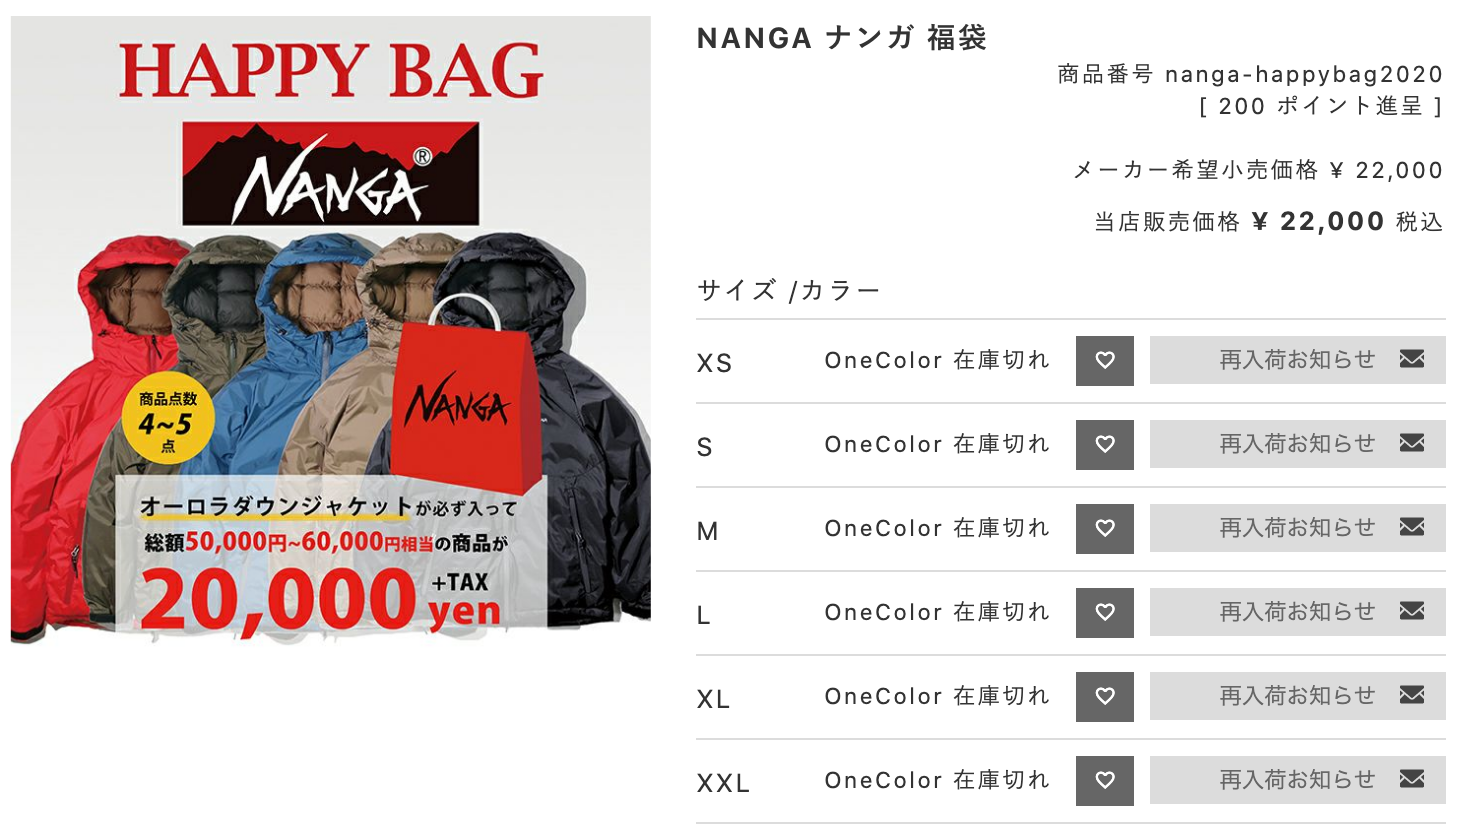 NANGA_ナンガ_福袋